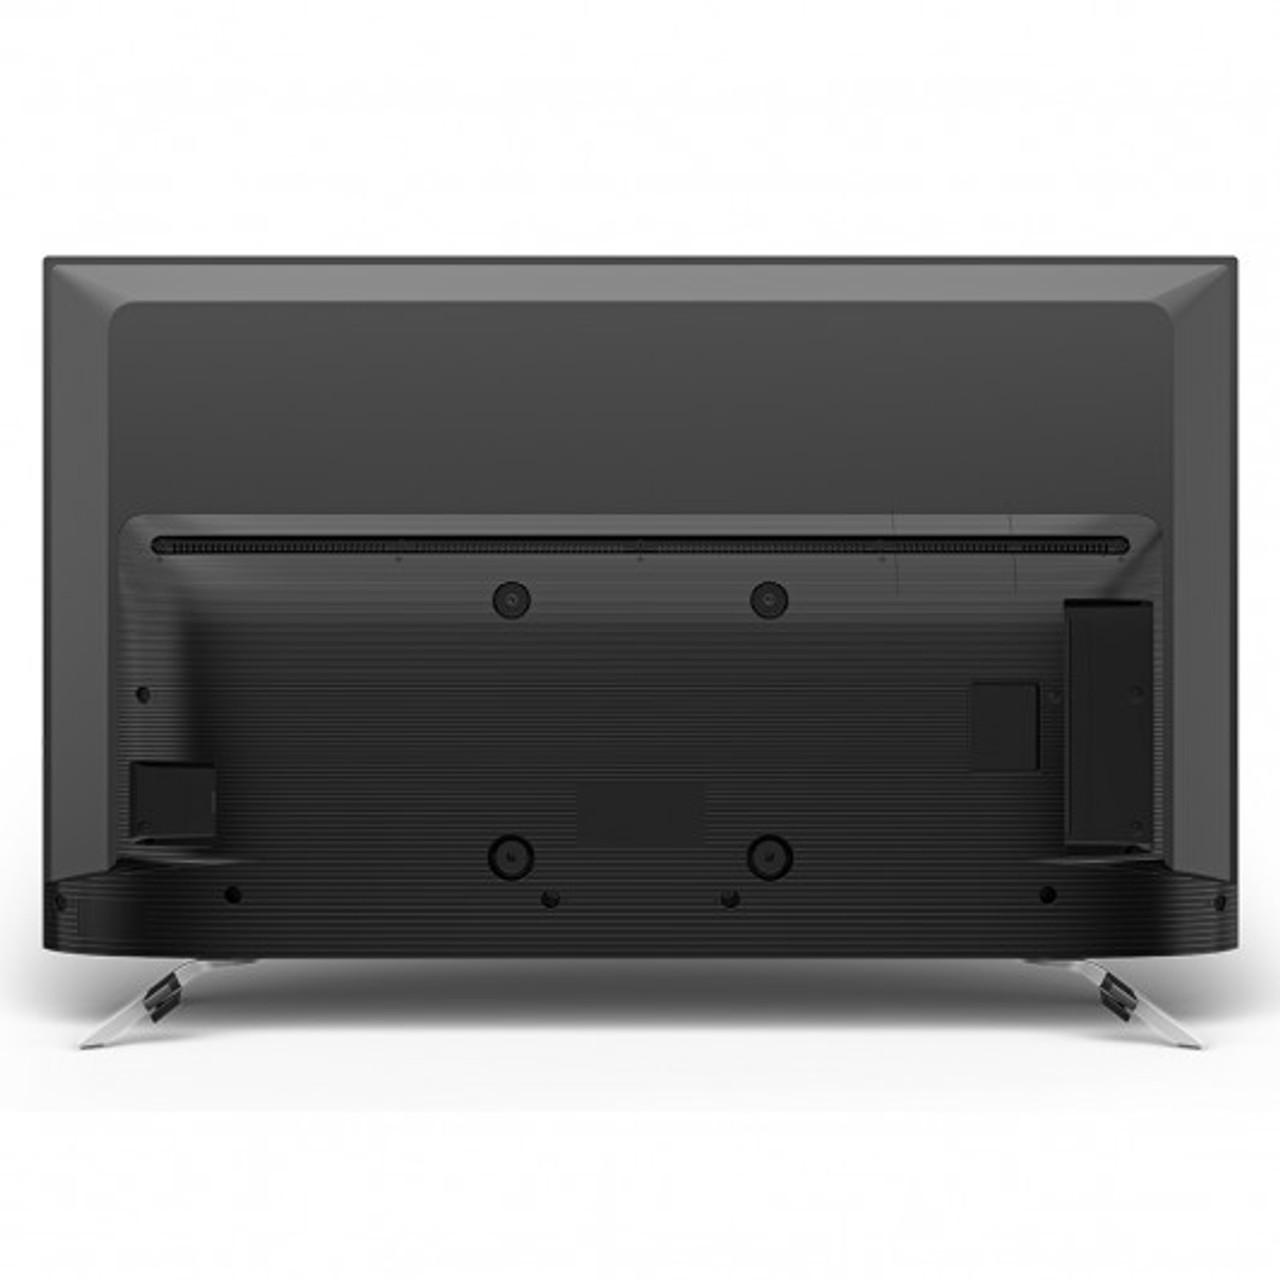 Hisense 43A7G 43-Inch Series A7G 4K UHD LED LCD Smart TV